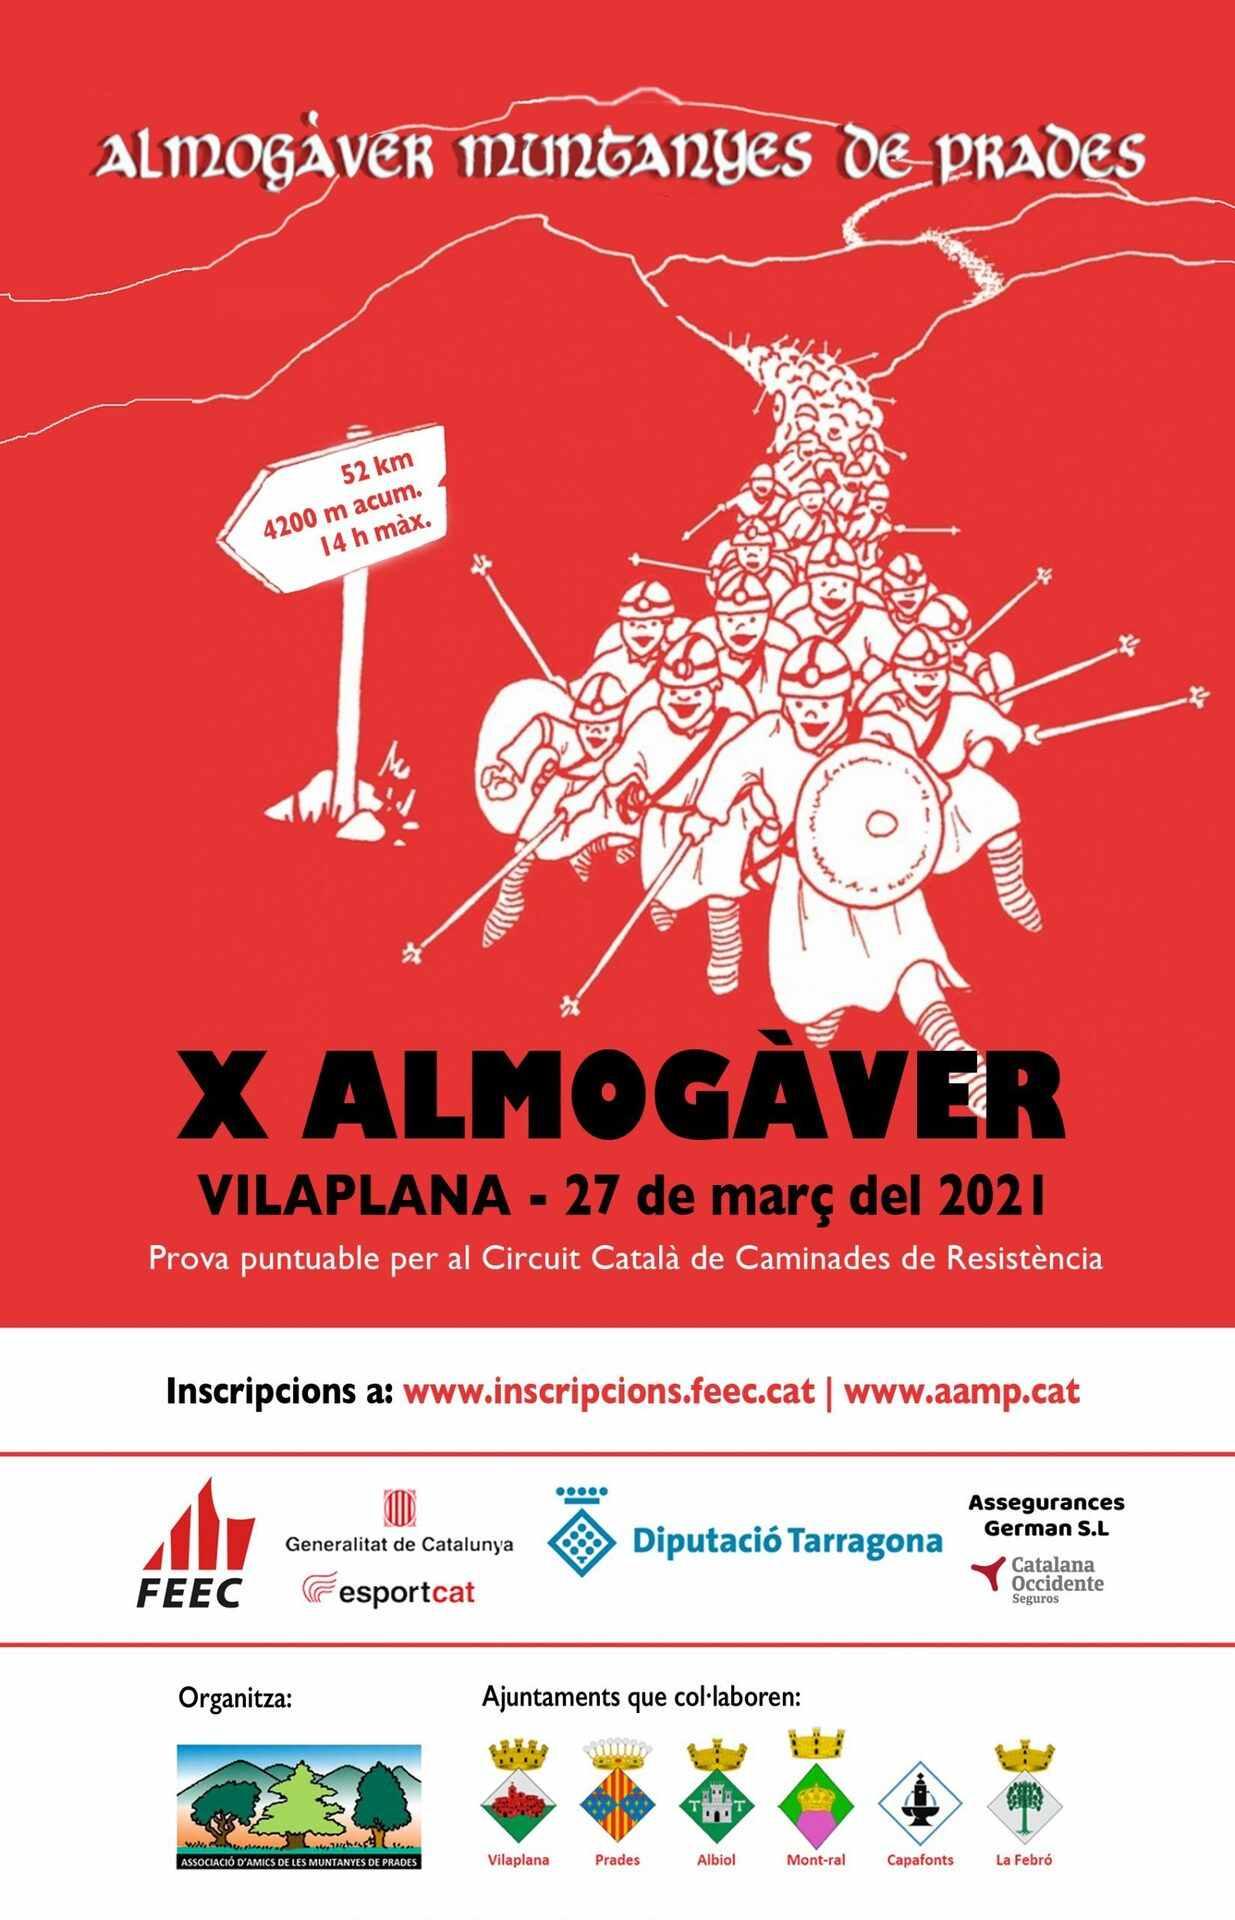 almogaver_2021_vfinal